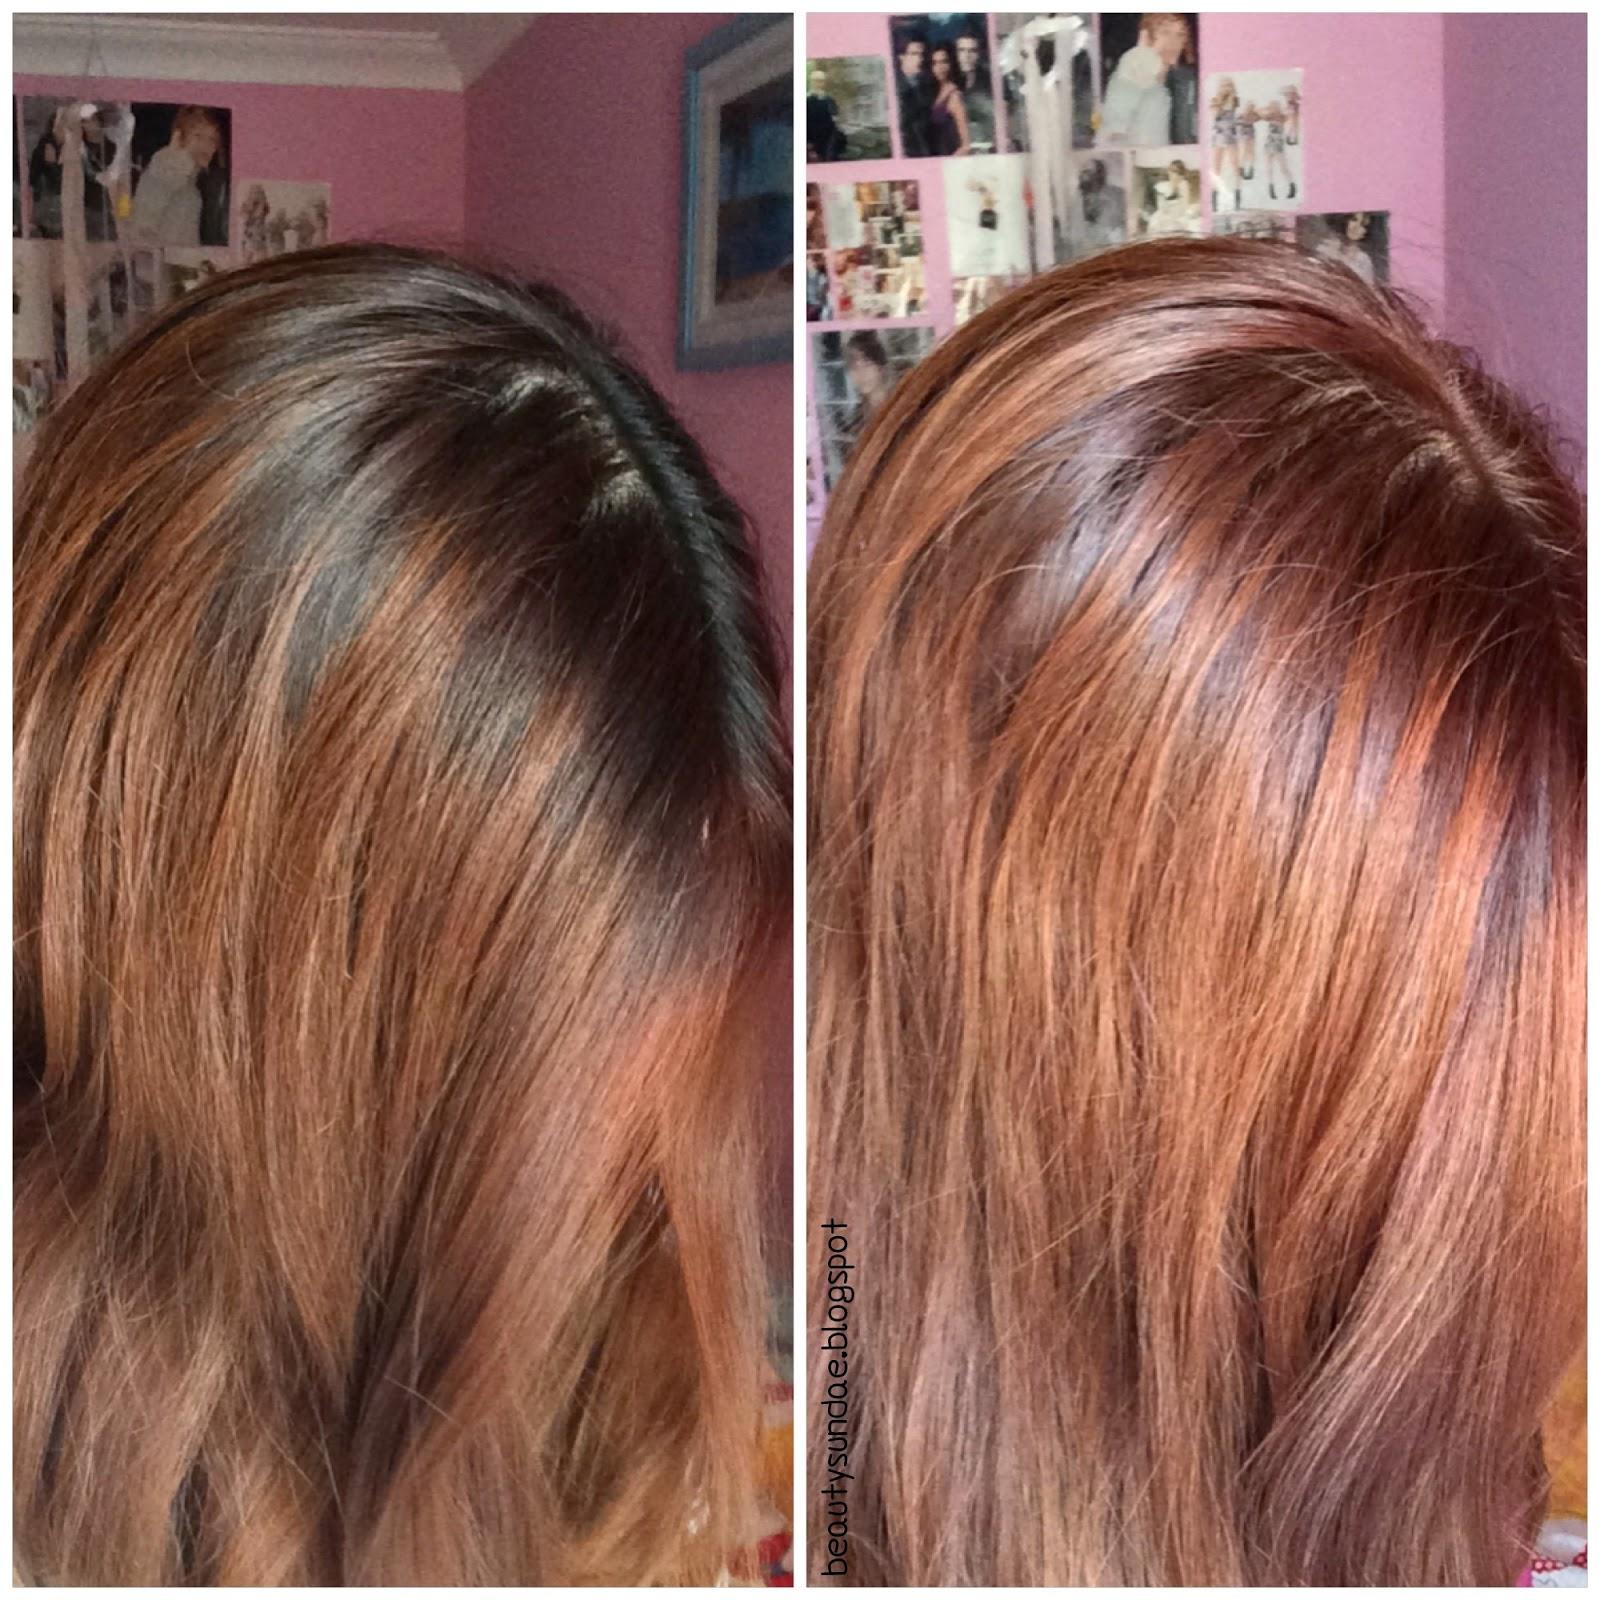 Golden apricot hair color : Restraunt vouchers